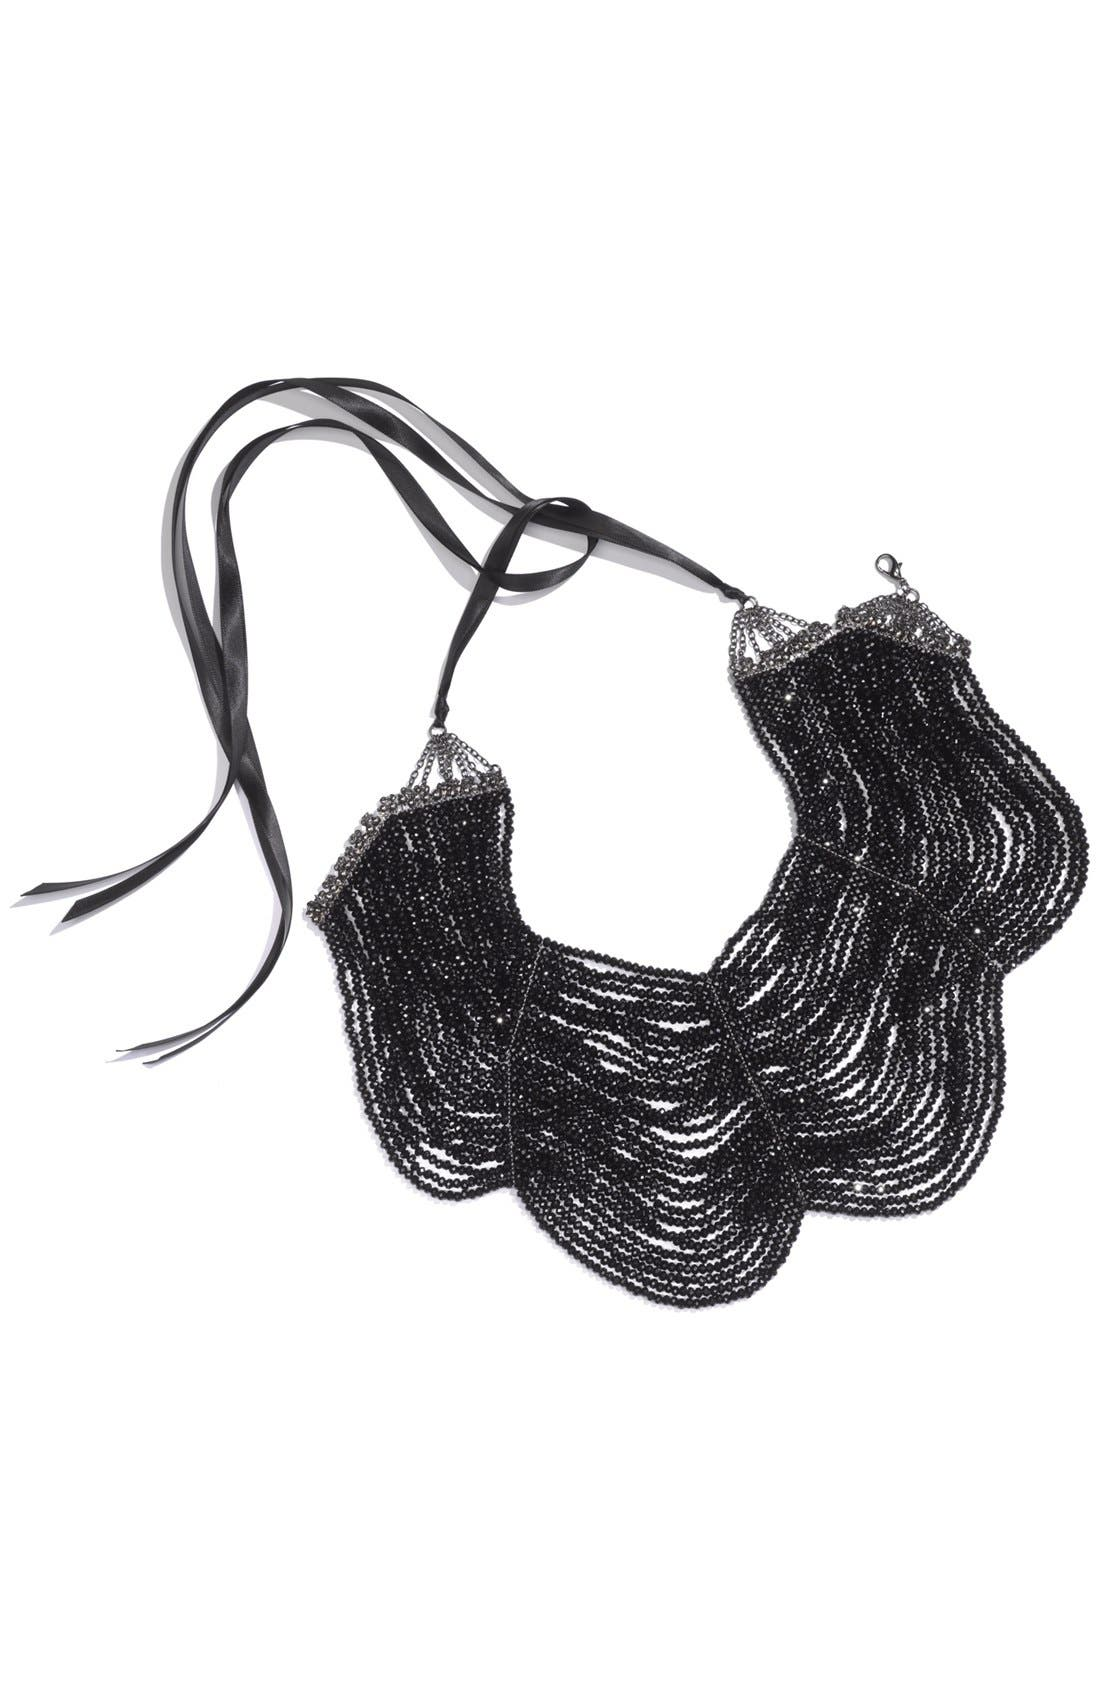 Alternate Image 1 Selected - Tasha 'Chandelier' Collar Necklace